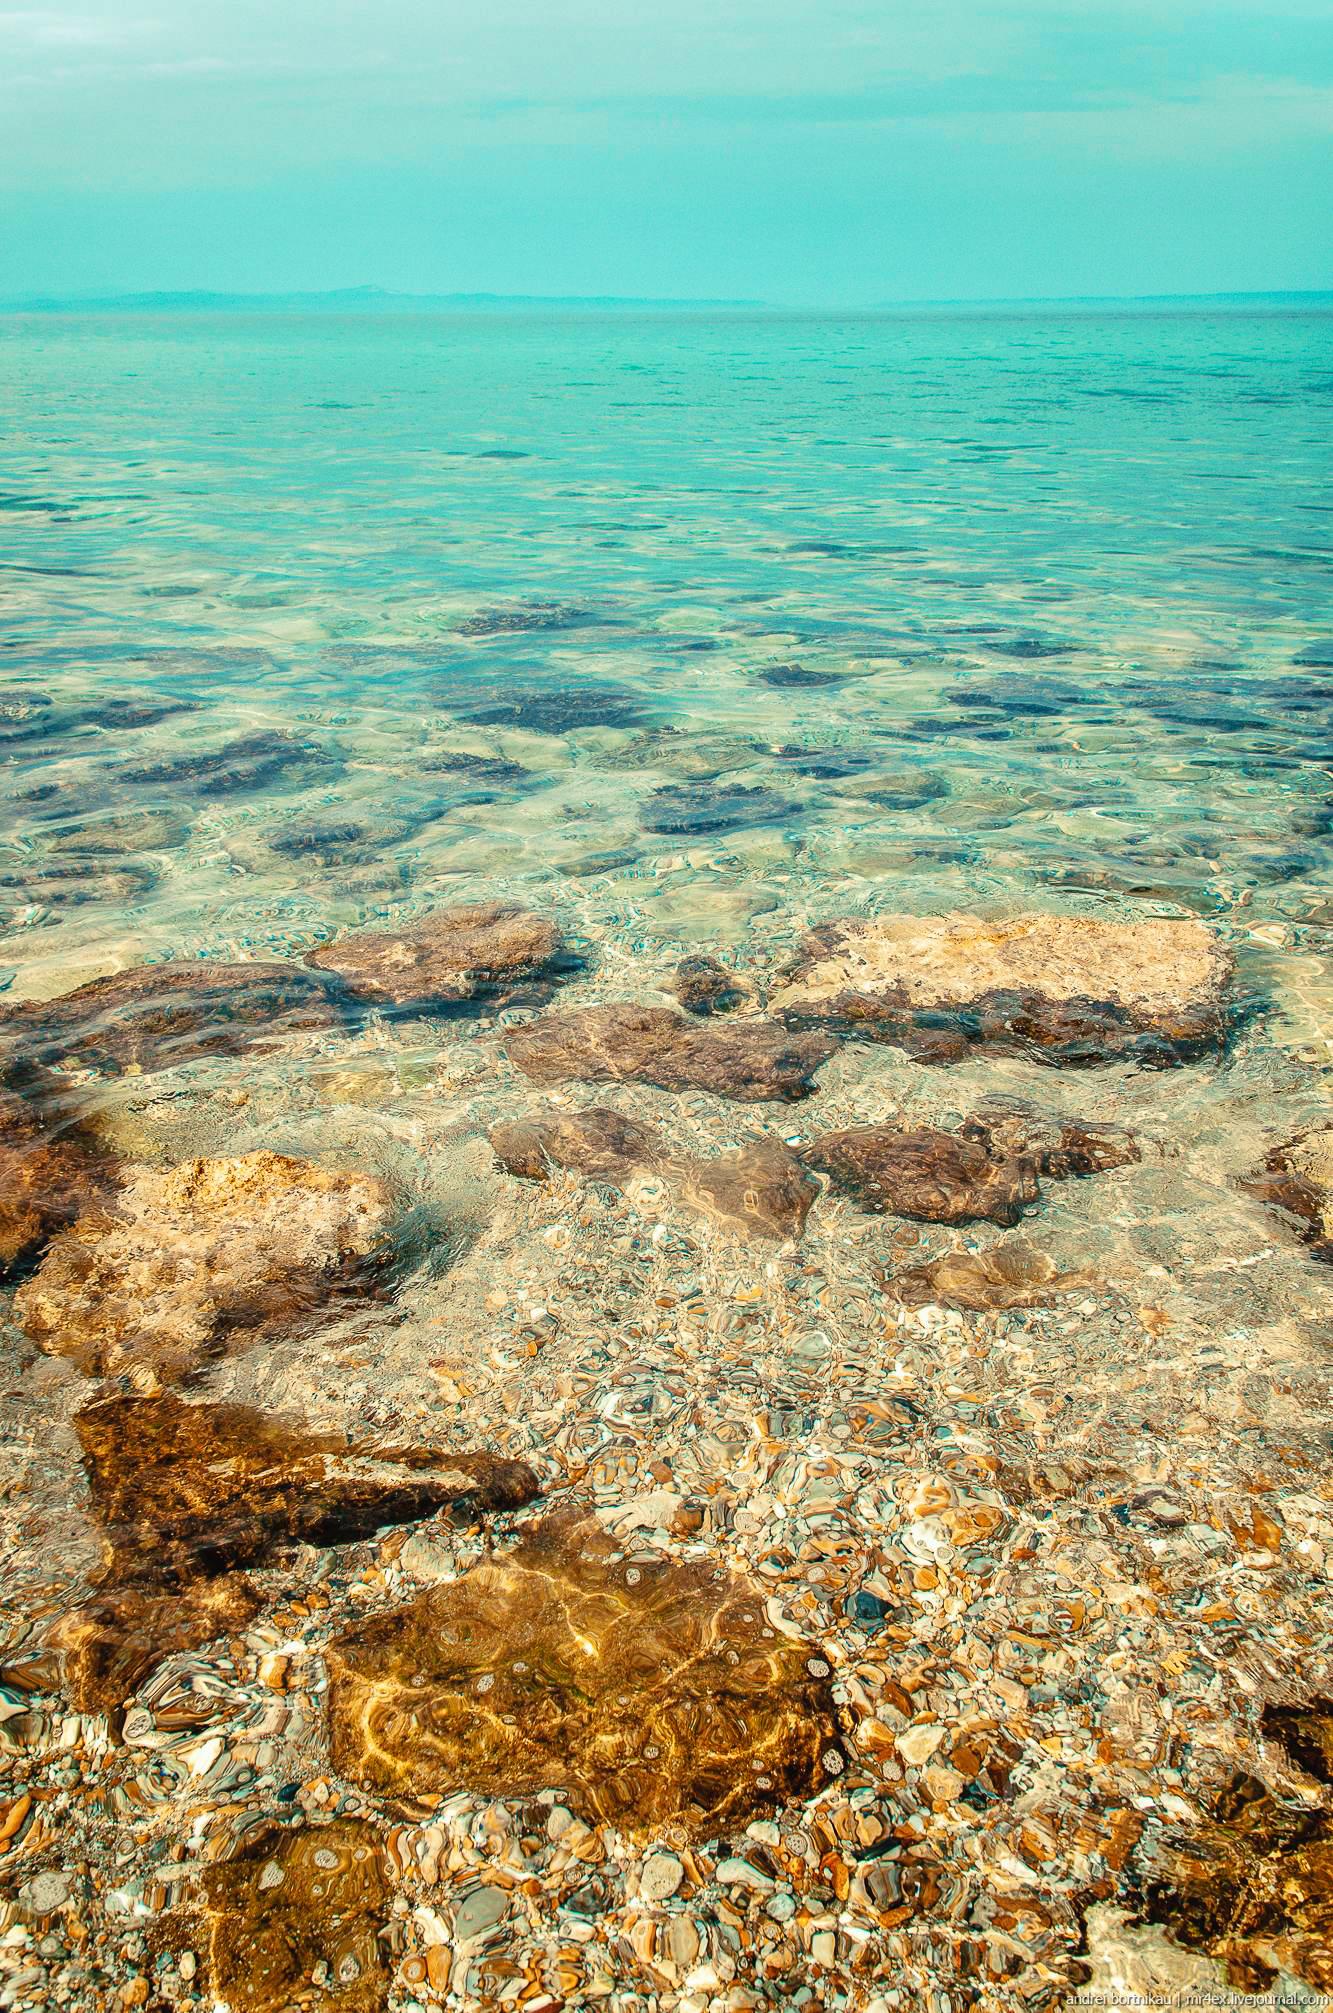 Кассандра, Халкидики, Греция, пляж с синим флагом